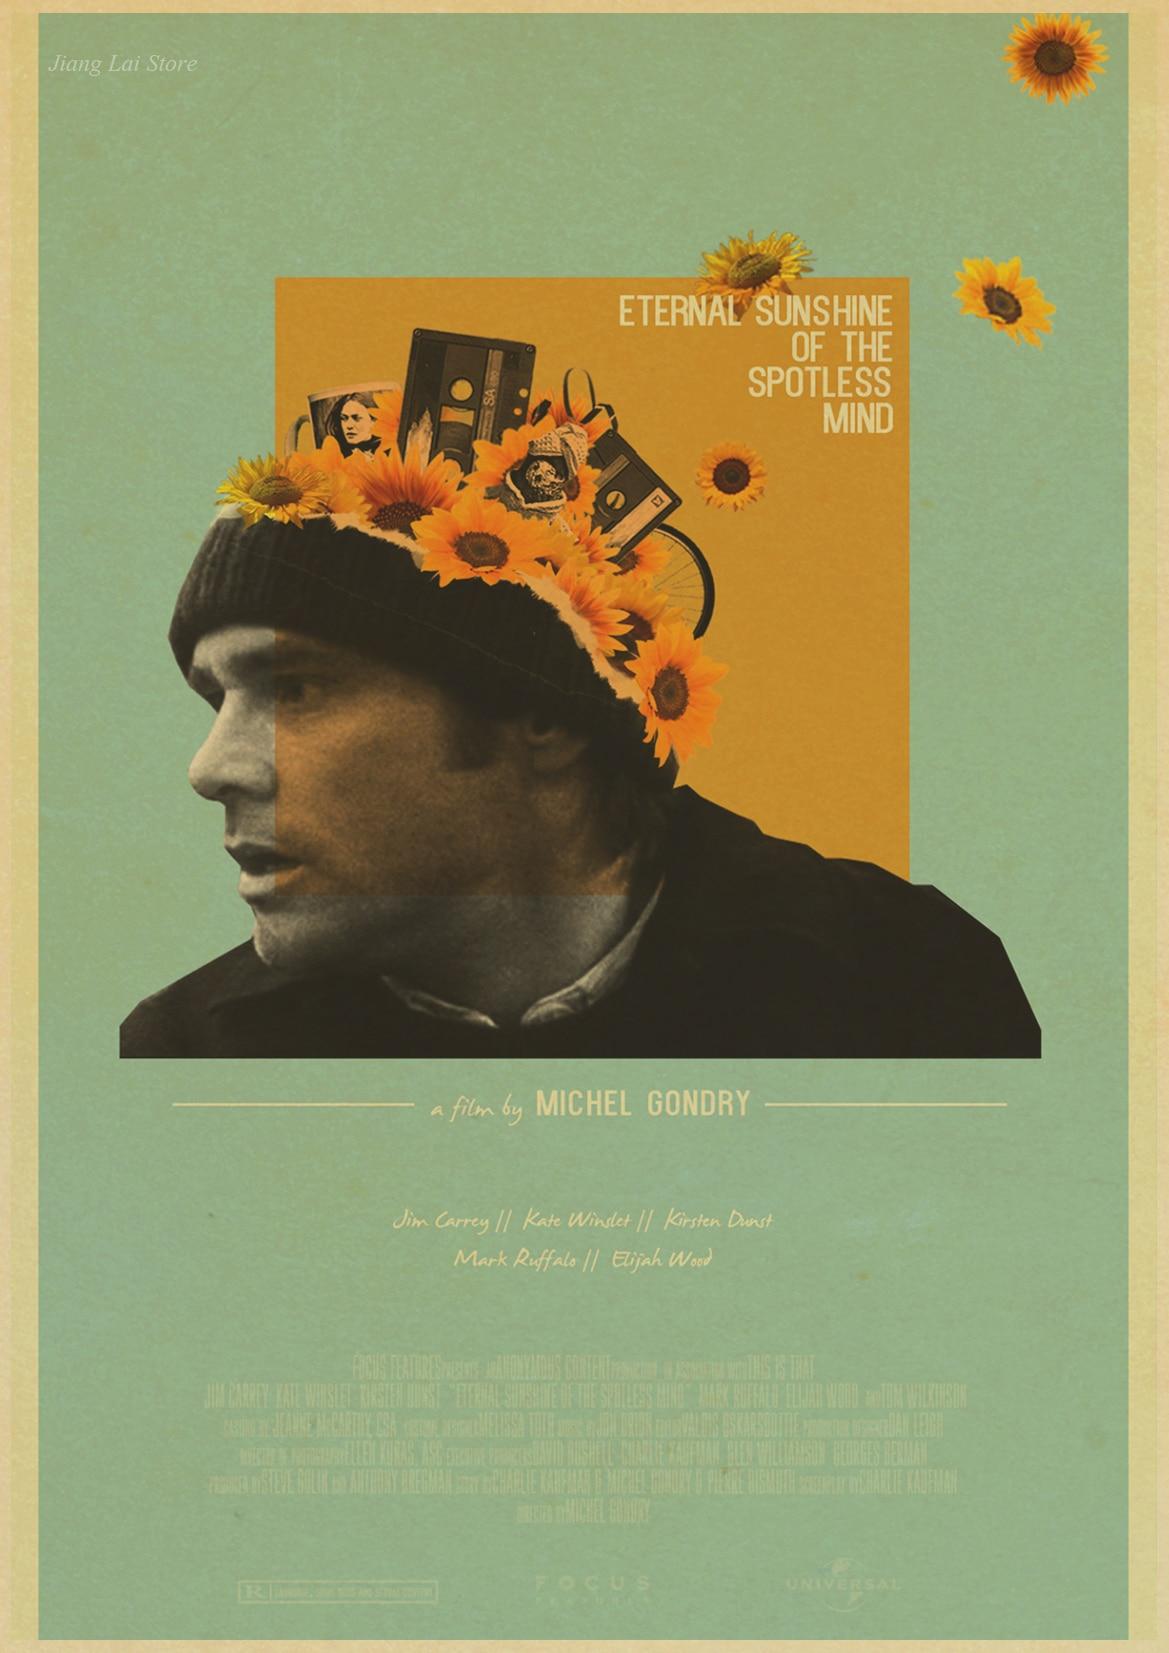 Eternal Sunshine Of The Spotless Mind Jim Carrey Movie Retro Poster